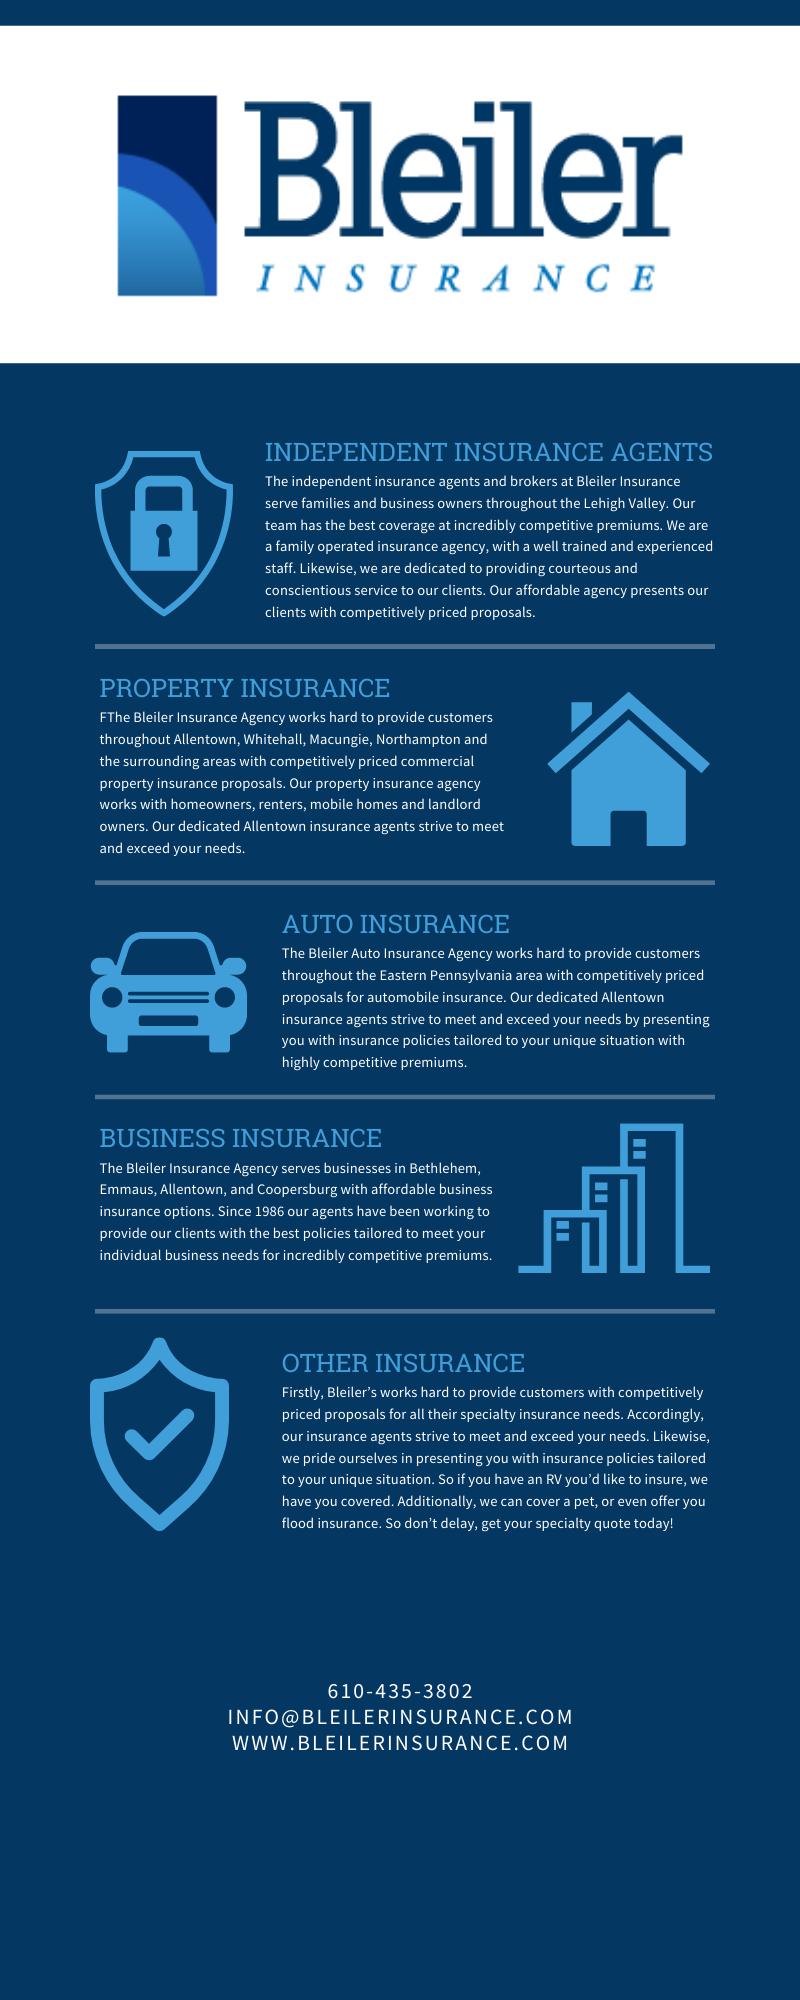 Bleiler Insurance Infographic May2021